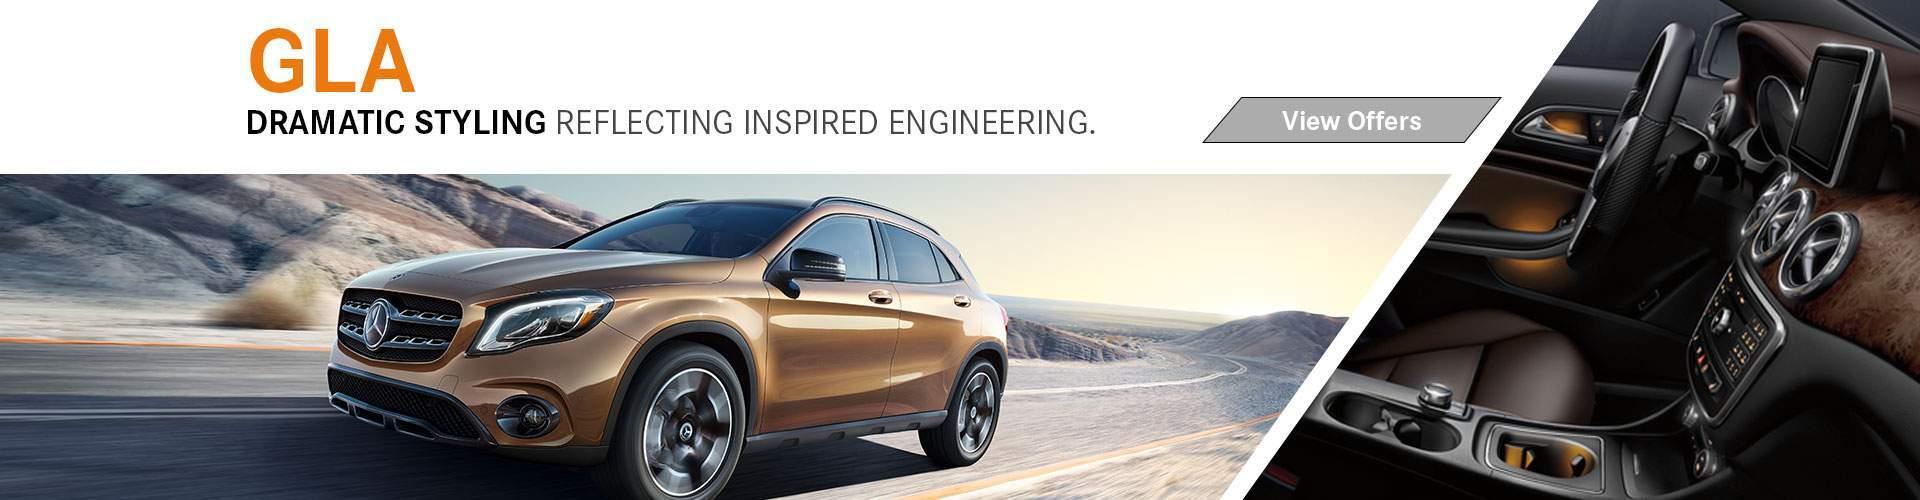 Mercedes benz dealership scottsdale az used cars for Mercedes benz employee discount program